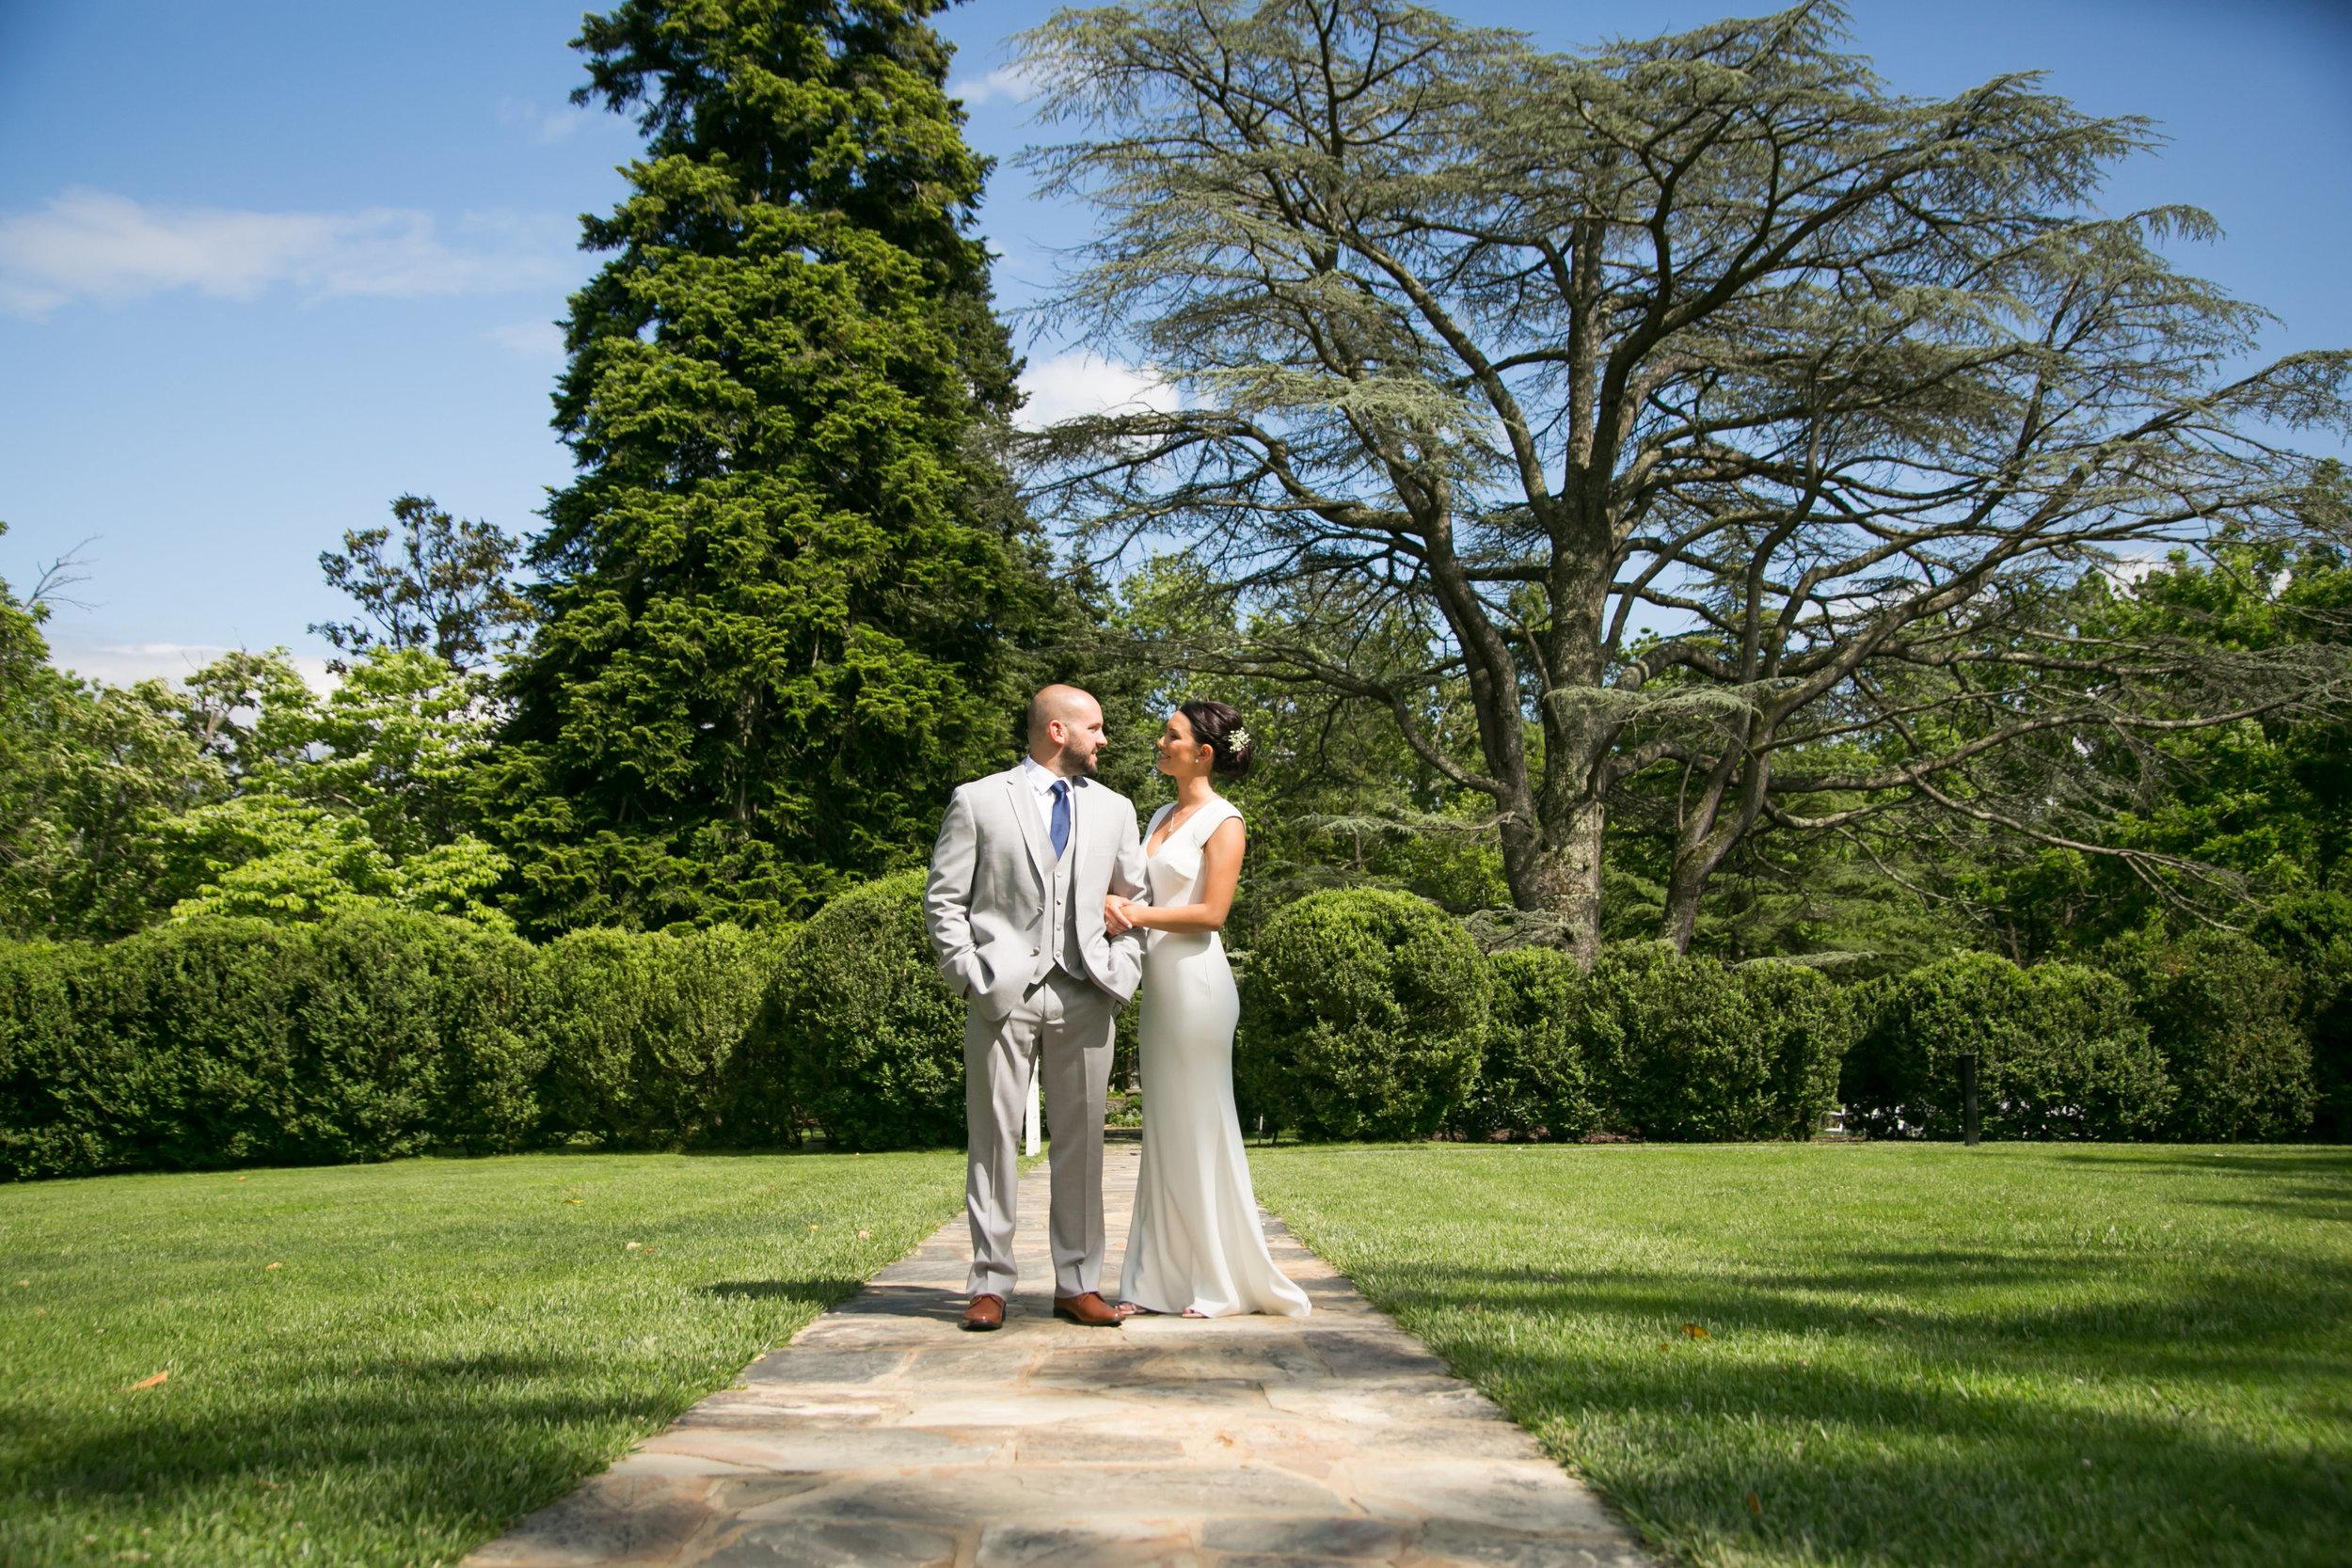 Pure elegance events Tynise Kee dc wedding planner va wedding planner rust manor house leesburg -0029.jpg